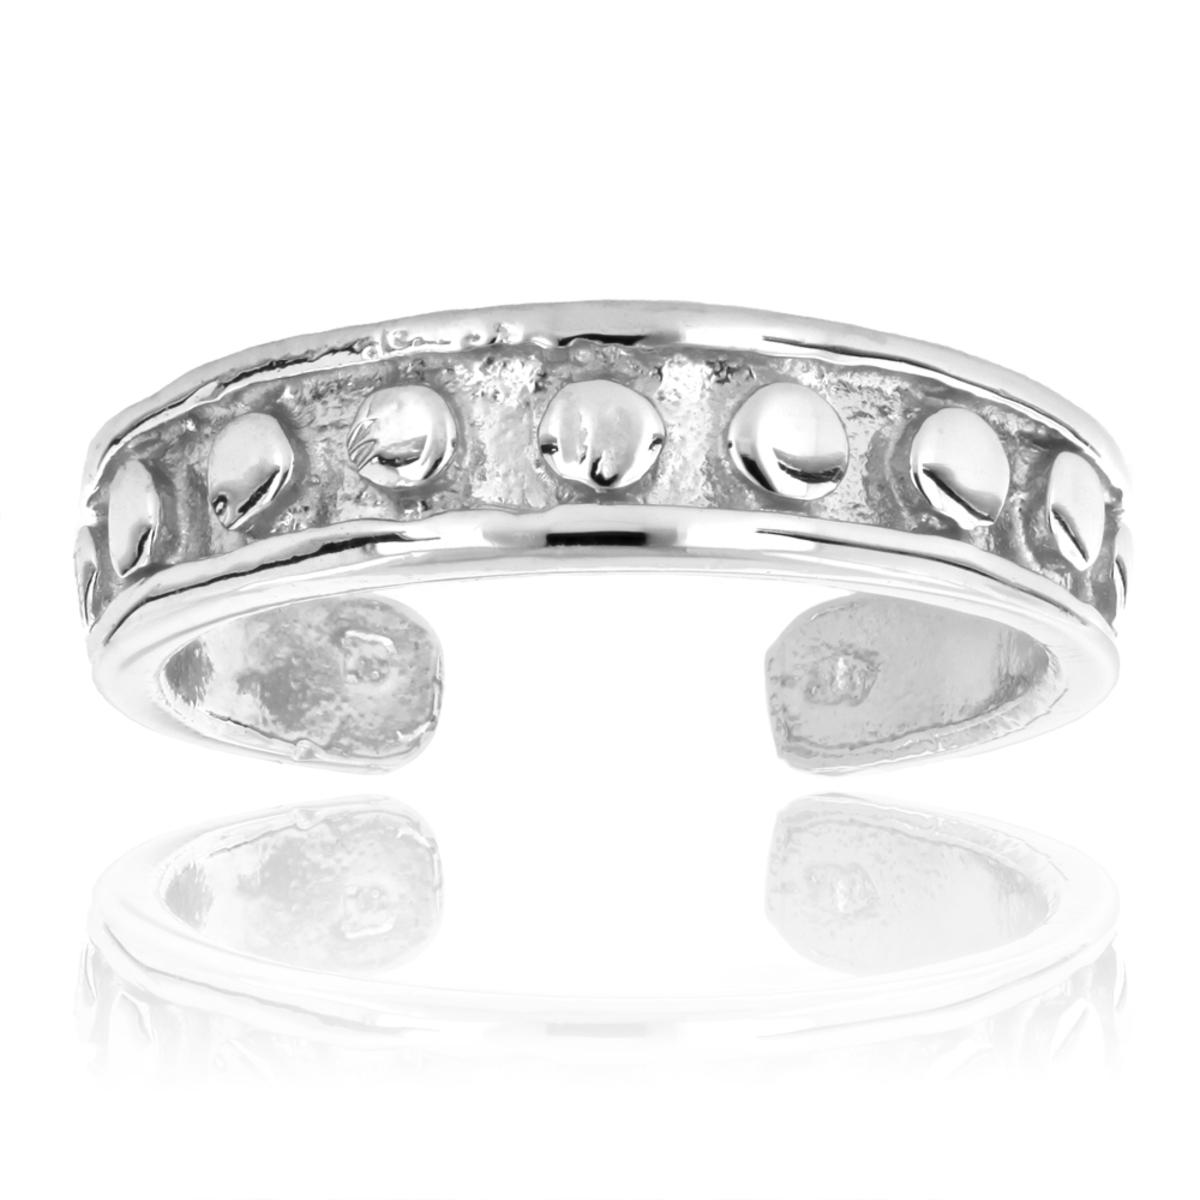 Thin Beautiful Toe Rings Adjustable 14K Solid Gold Toe Ring